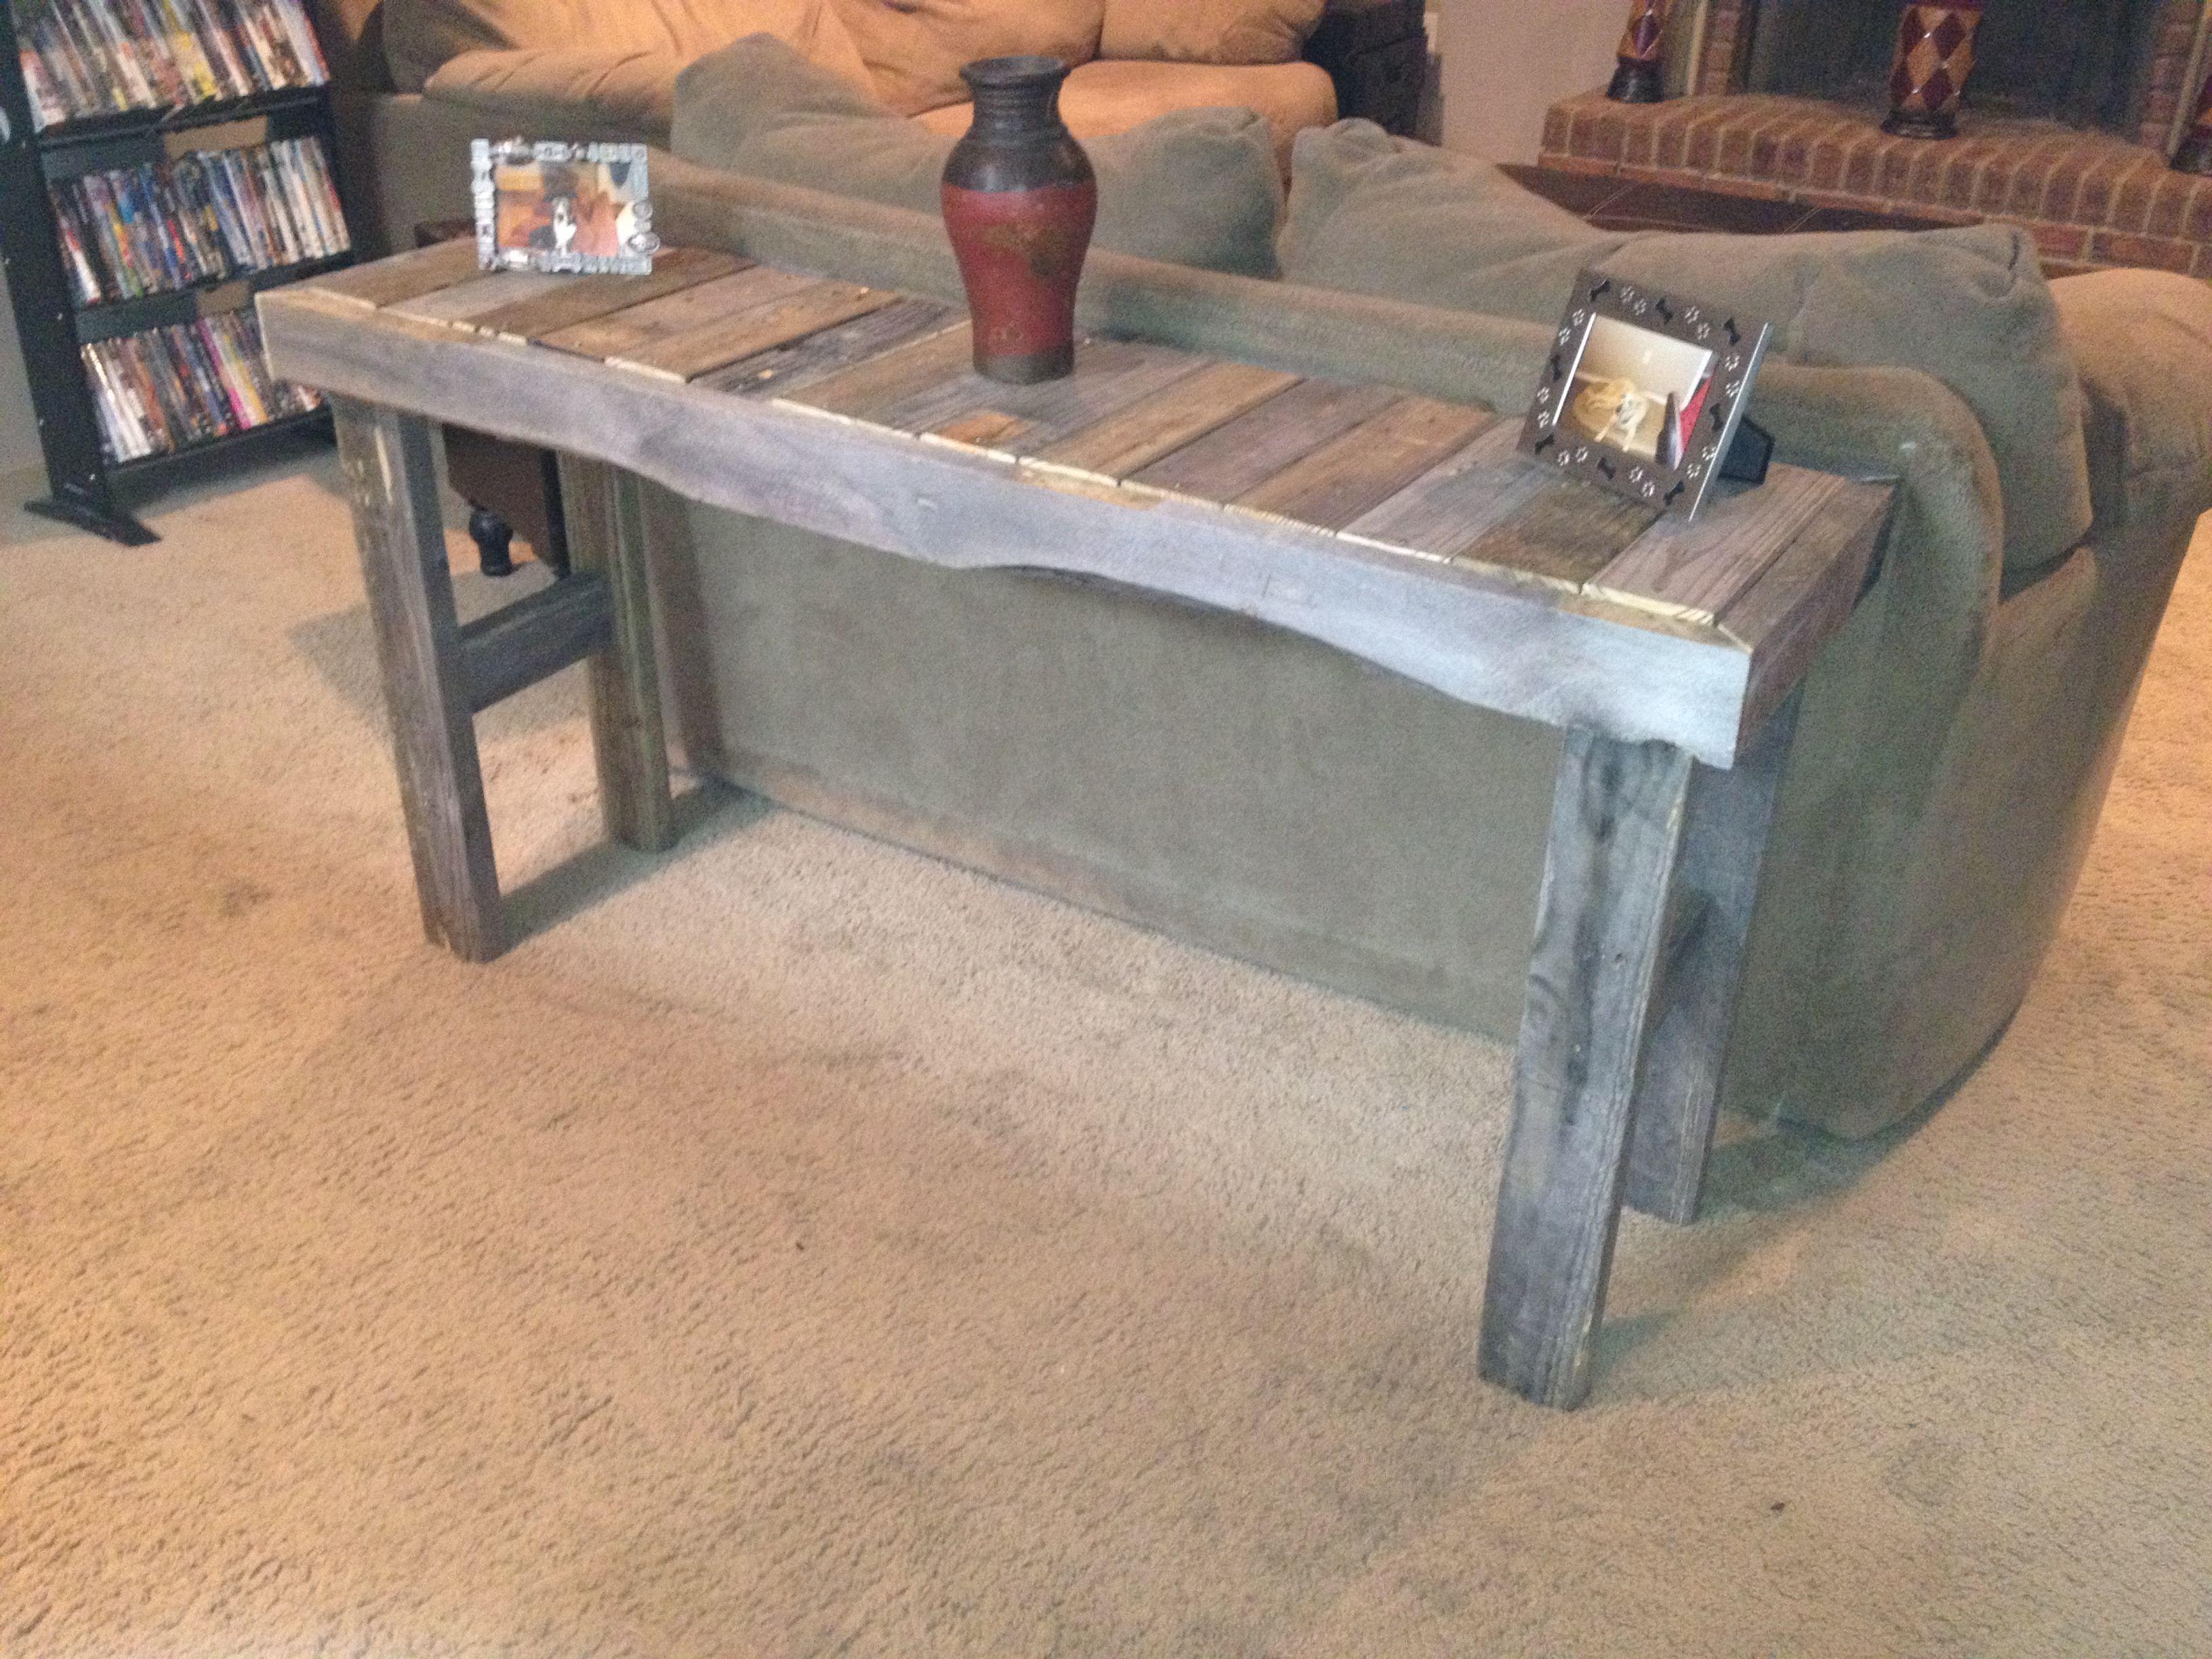 Sofa Table Made From Pallets Diy Sofa Table Diy Sofa Pallet